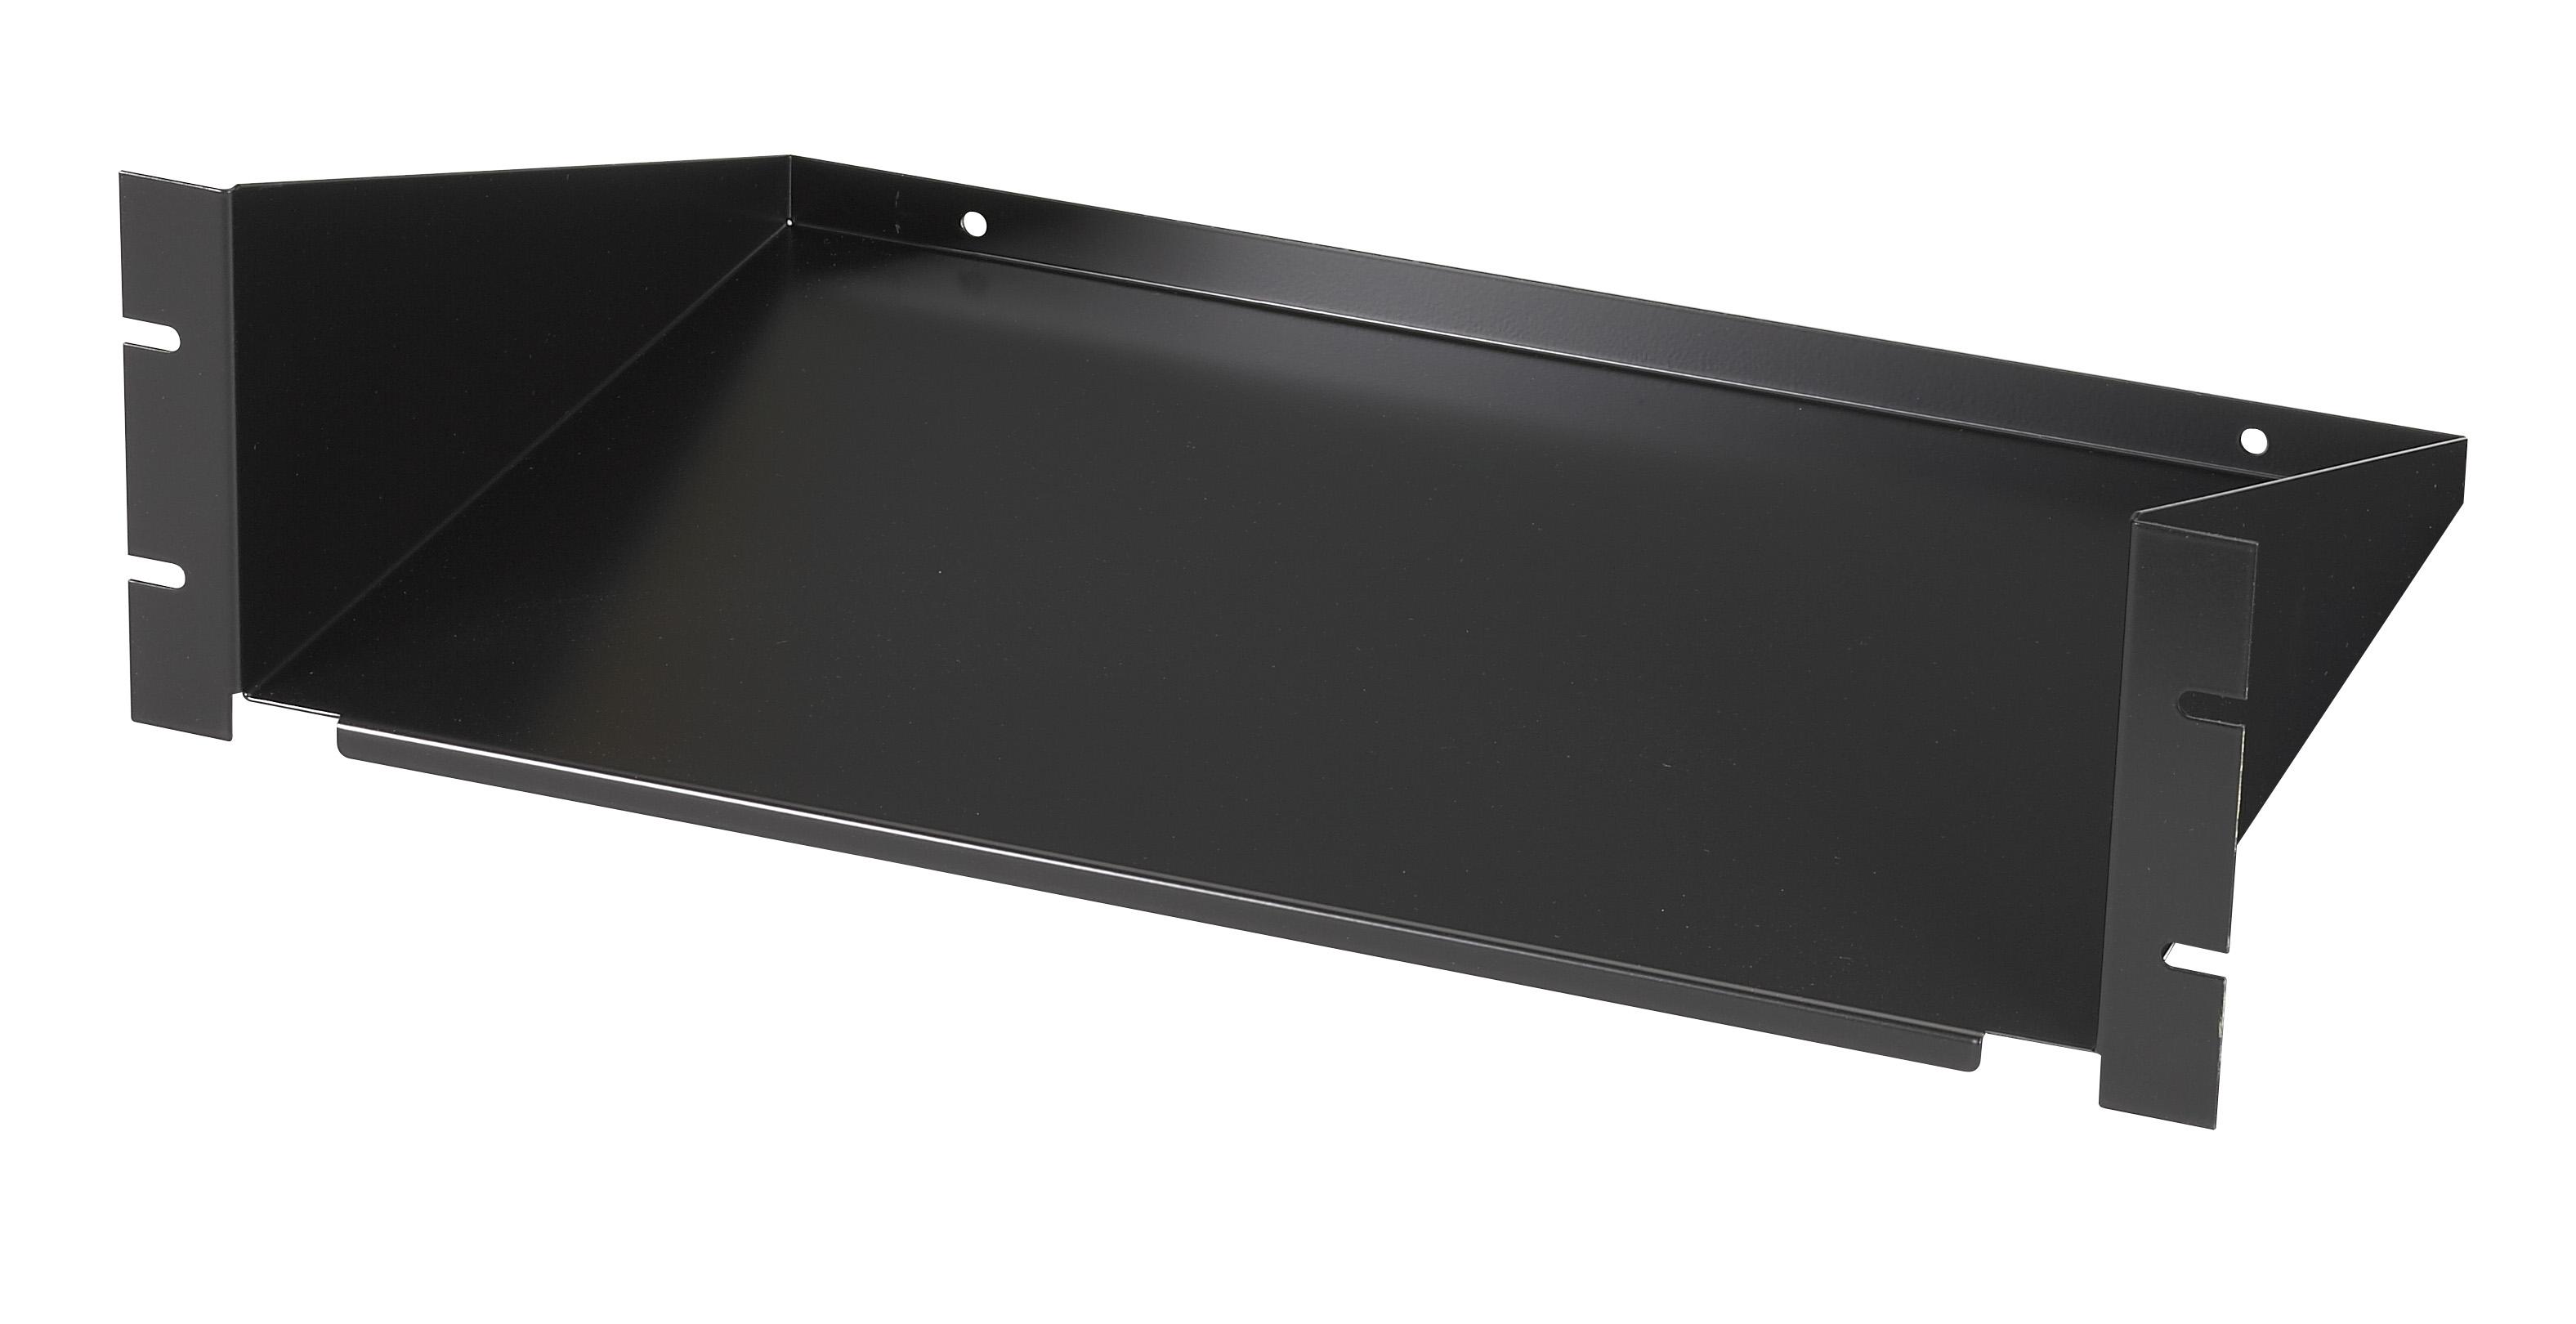 mount inch rack shelves vented steel durable dp our amazon com construction startech cantilever shelf